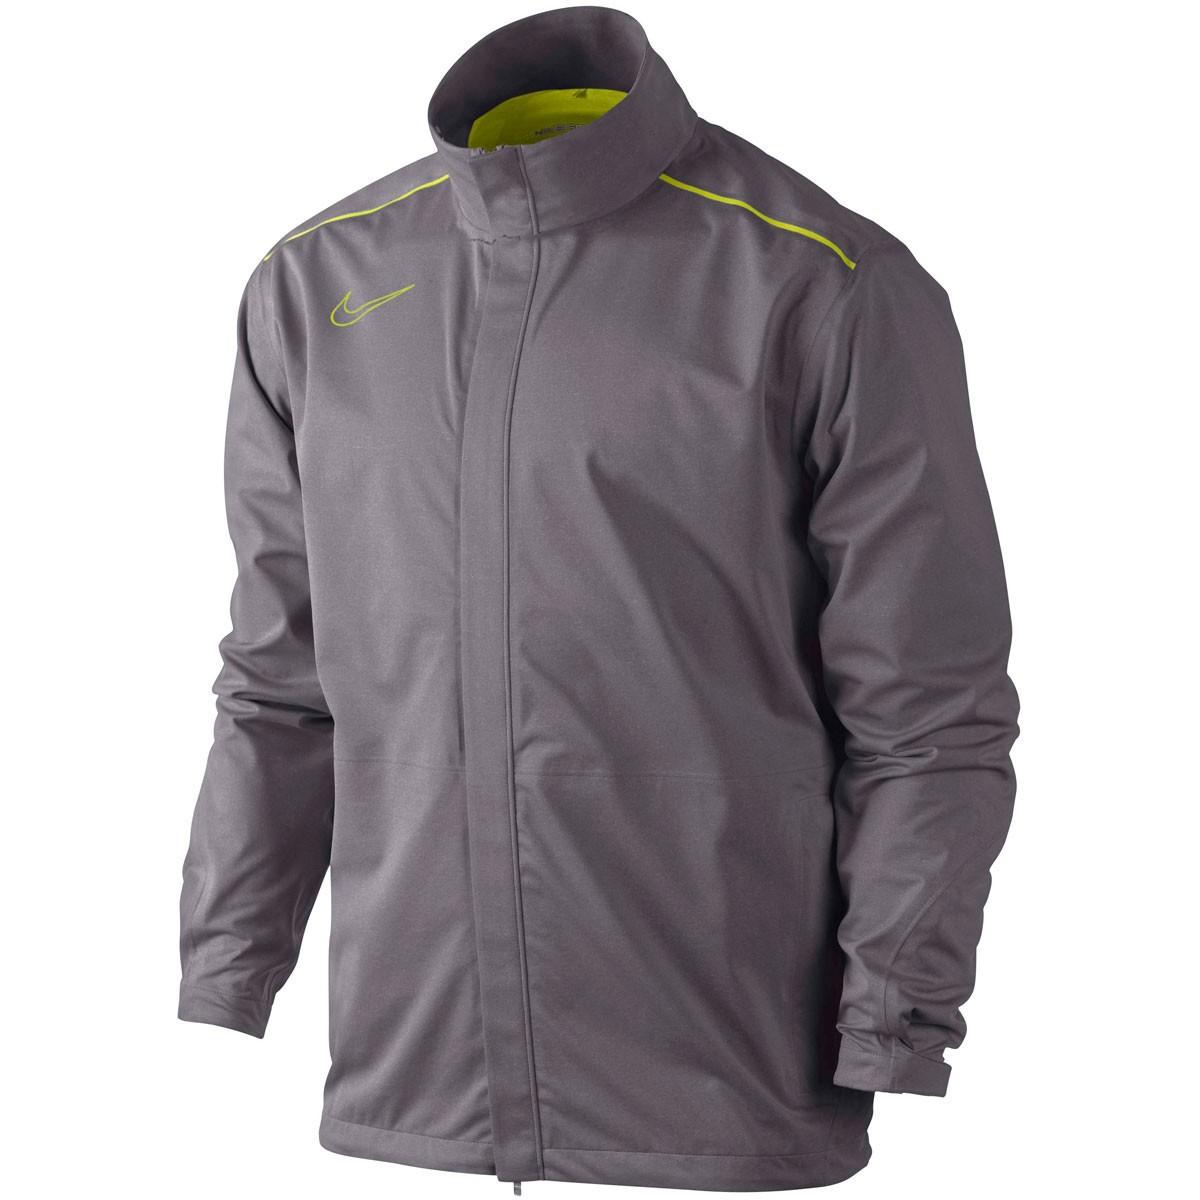 da520efe8768 Nike Golf Mens Storm-FIT Full Zip Waterproof Jacket - Men